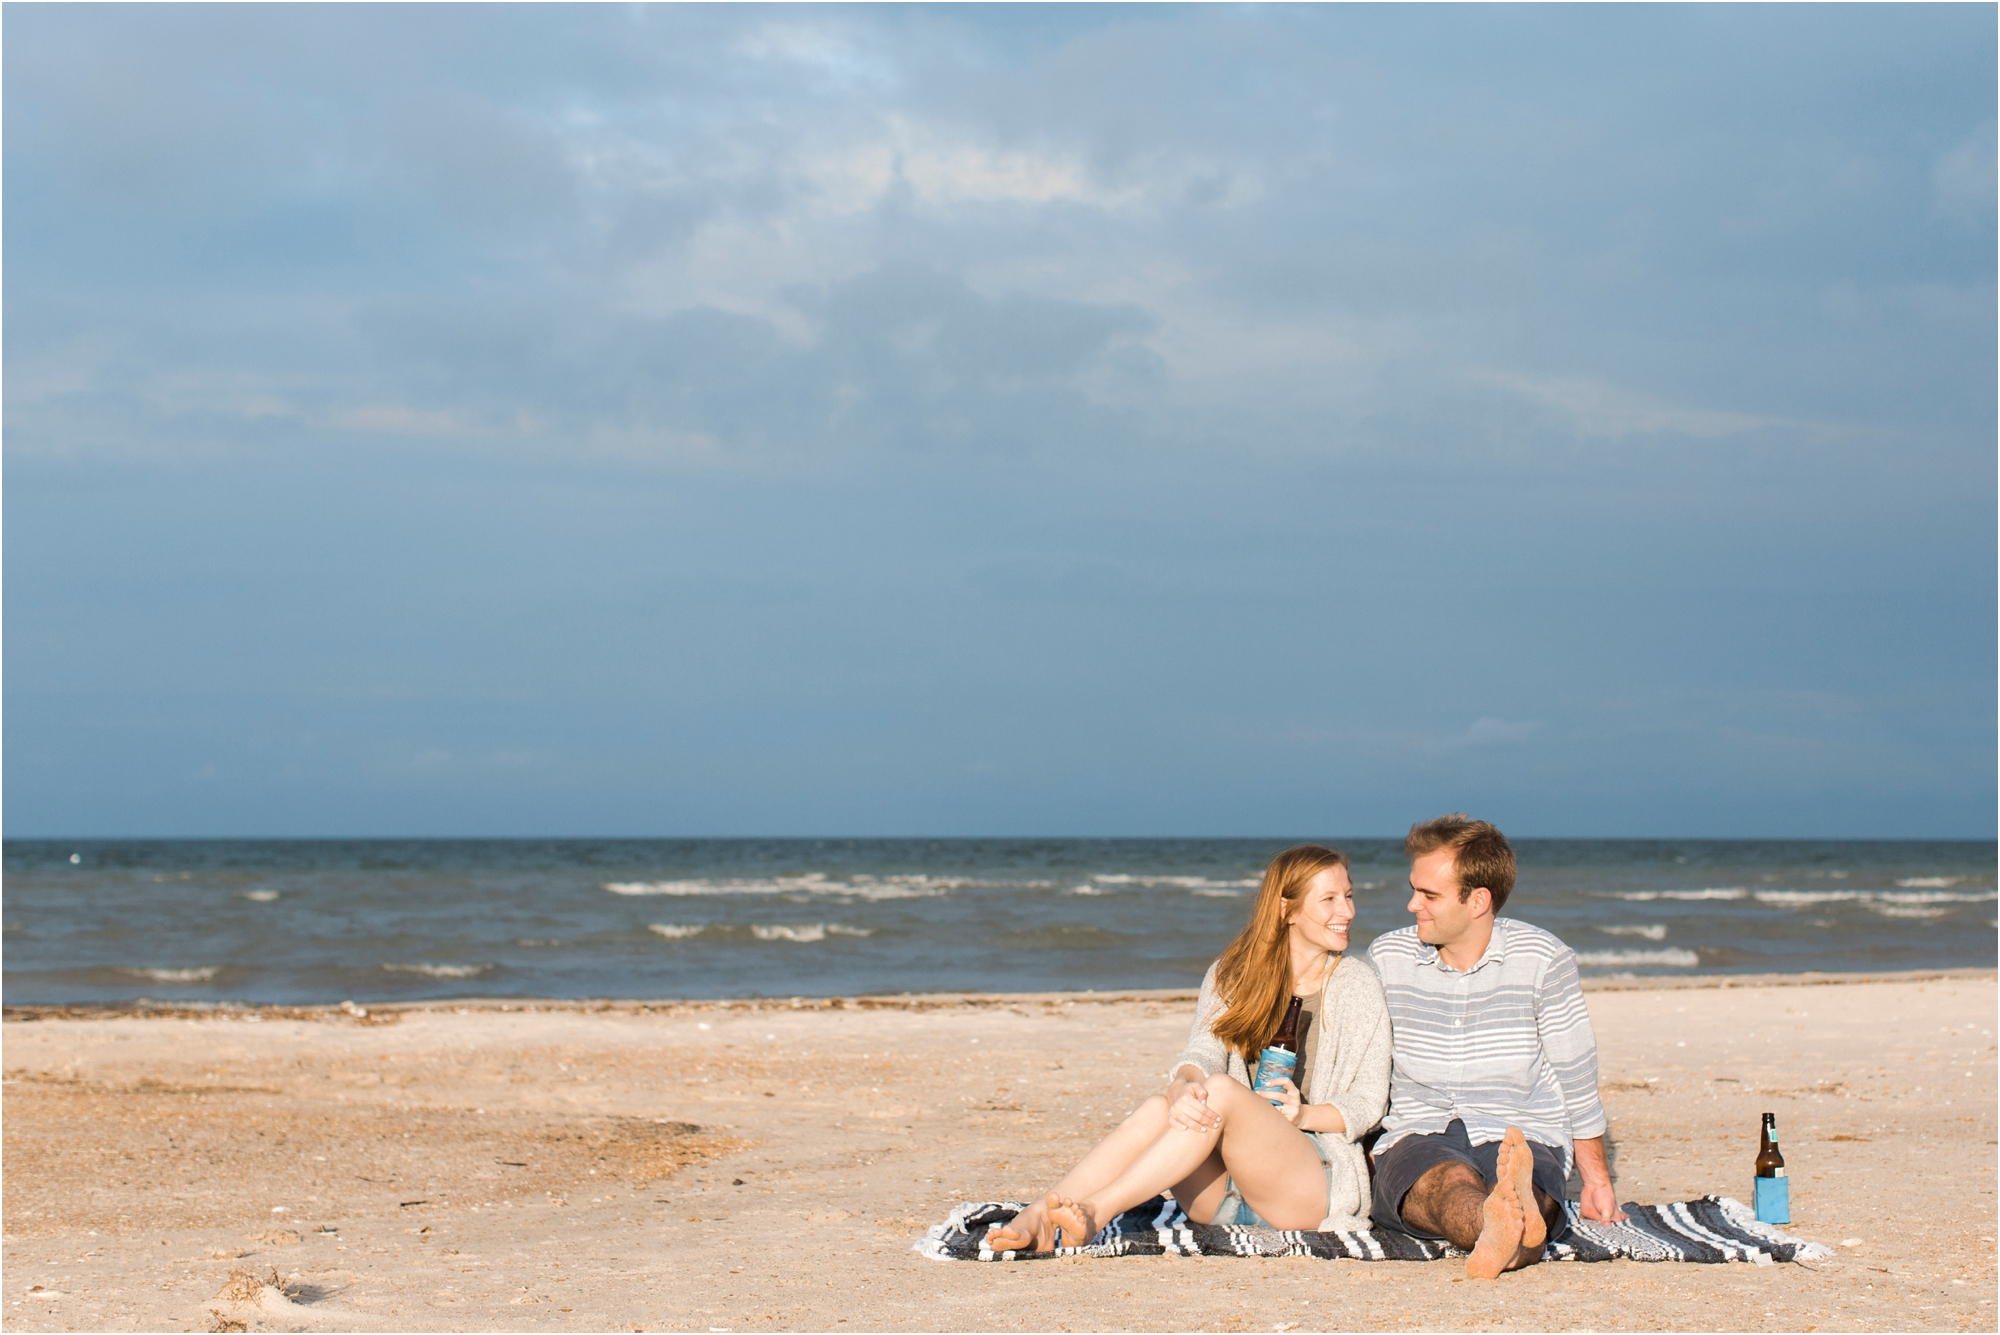 emily-drew-chesapeake-bay-beach-virginia-engagement-photos_0005.jpg